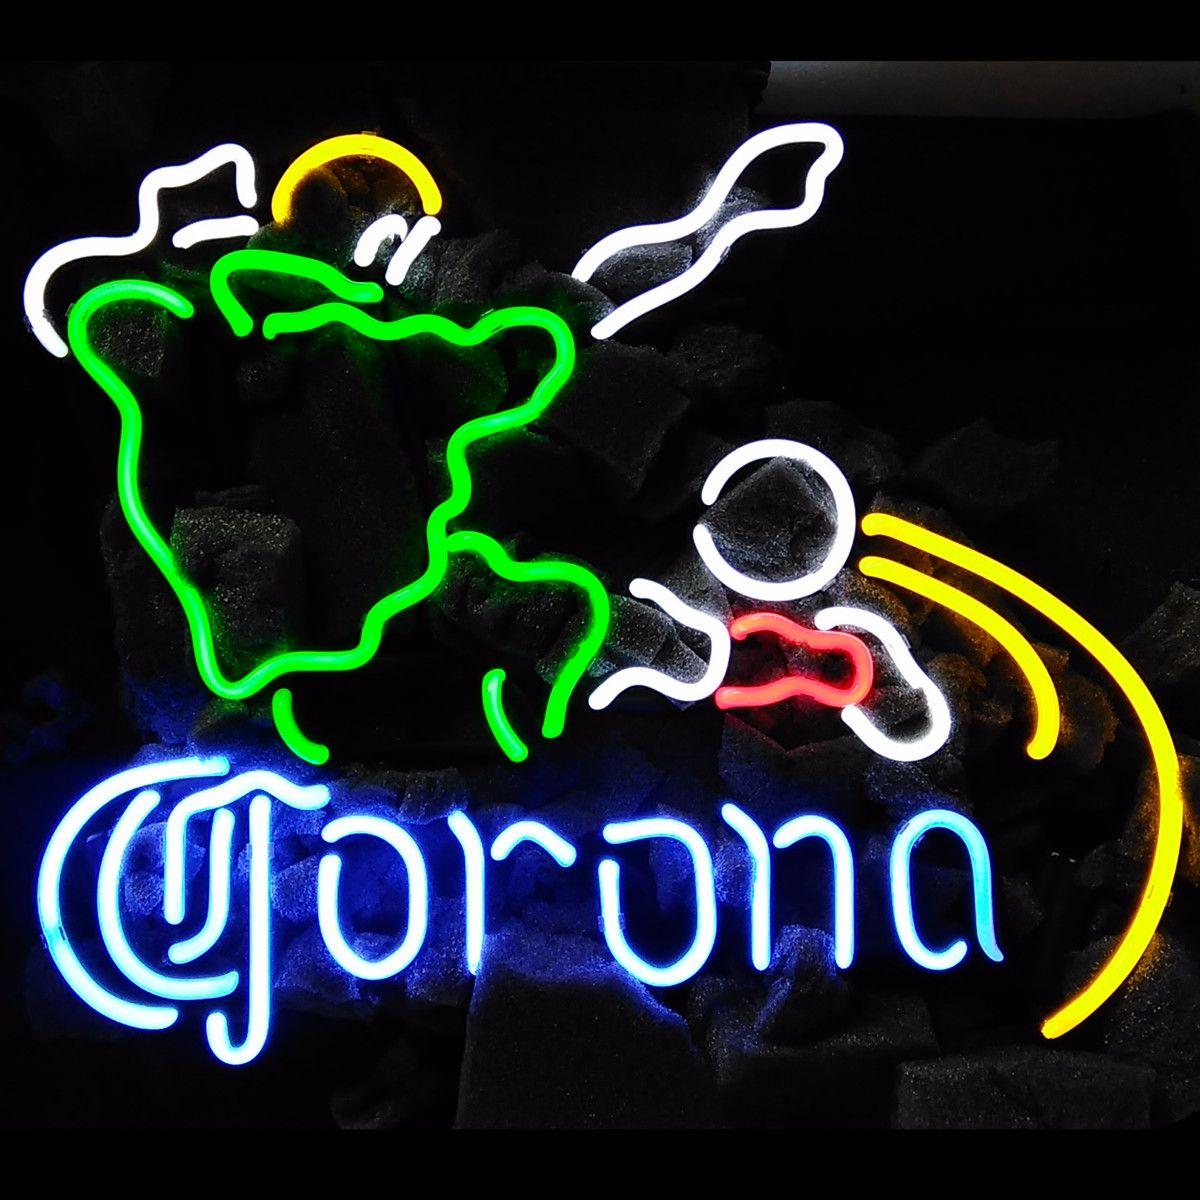 "17""x14"" Corona Football Beer Pub Bar Store Real Glass Neon Light Sign Tavern Display Wall Lighting"